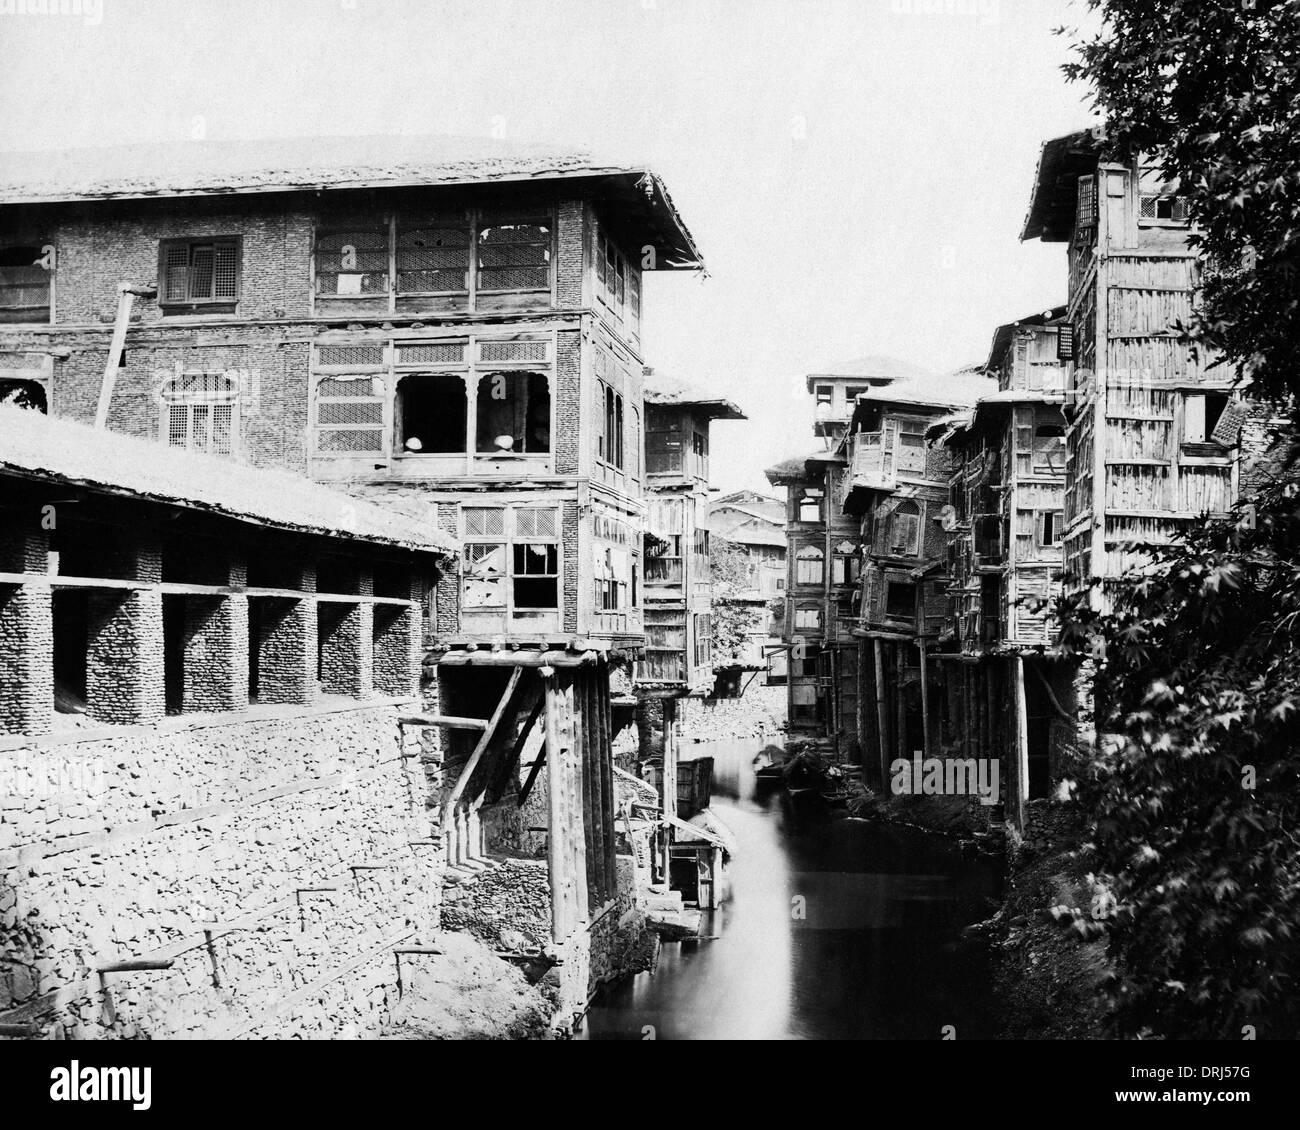 Merchants' houses, Marqual Canal, Srinagar, India - Stock Image